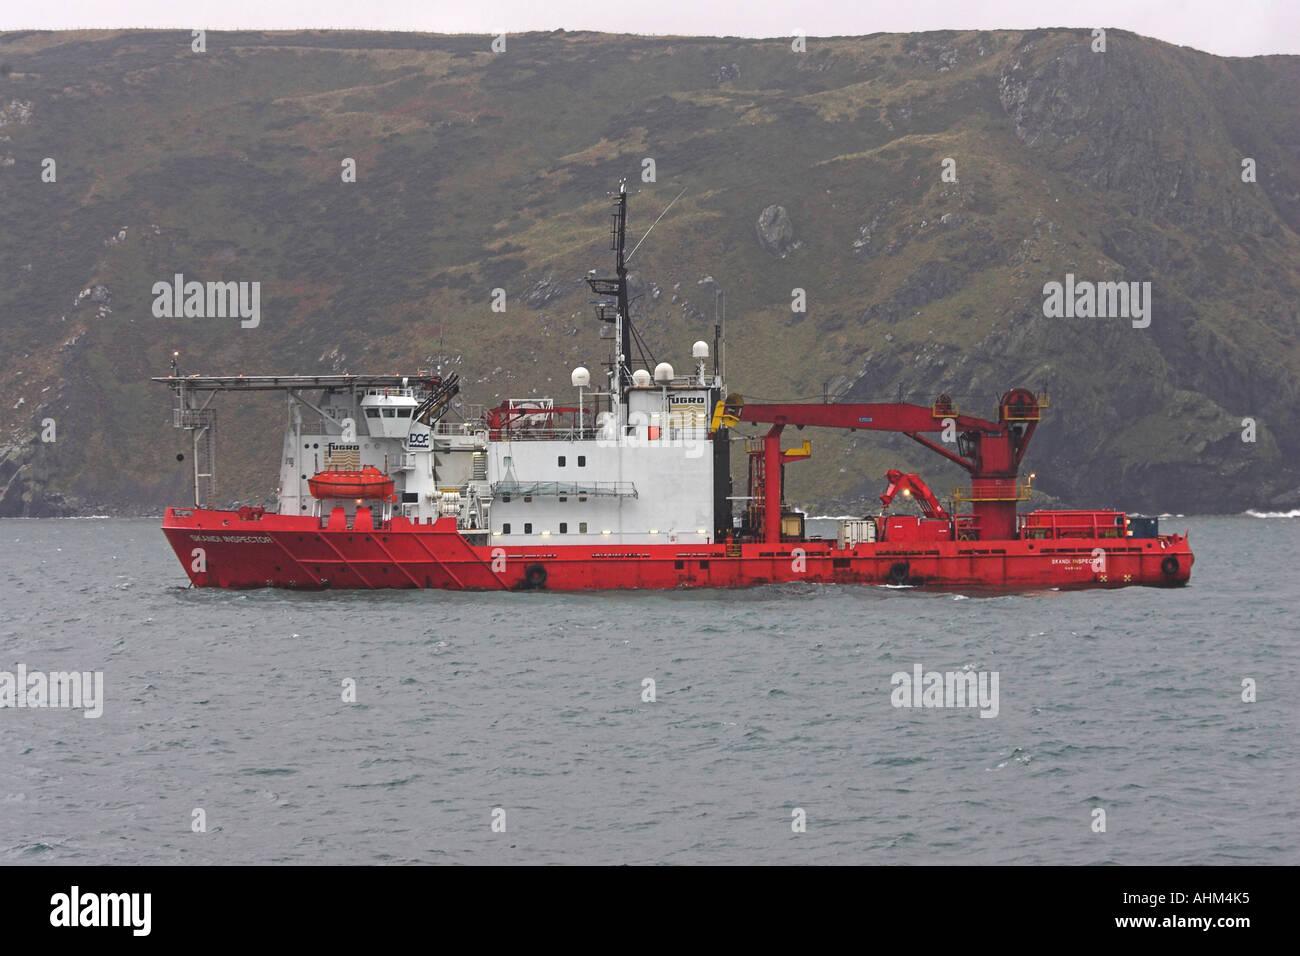 skandi inspector fugro survey rov boat - Stock Image